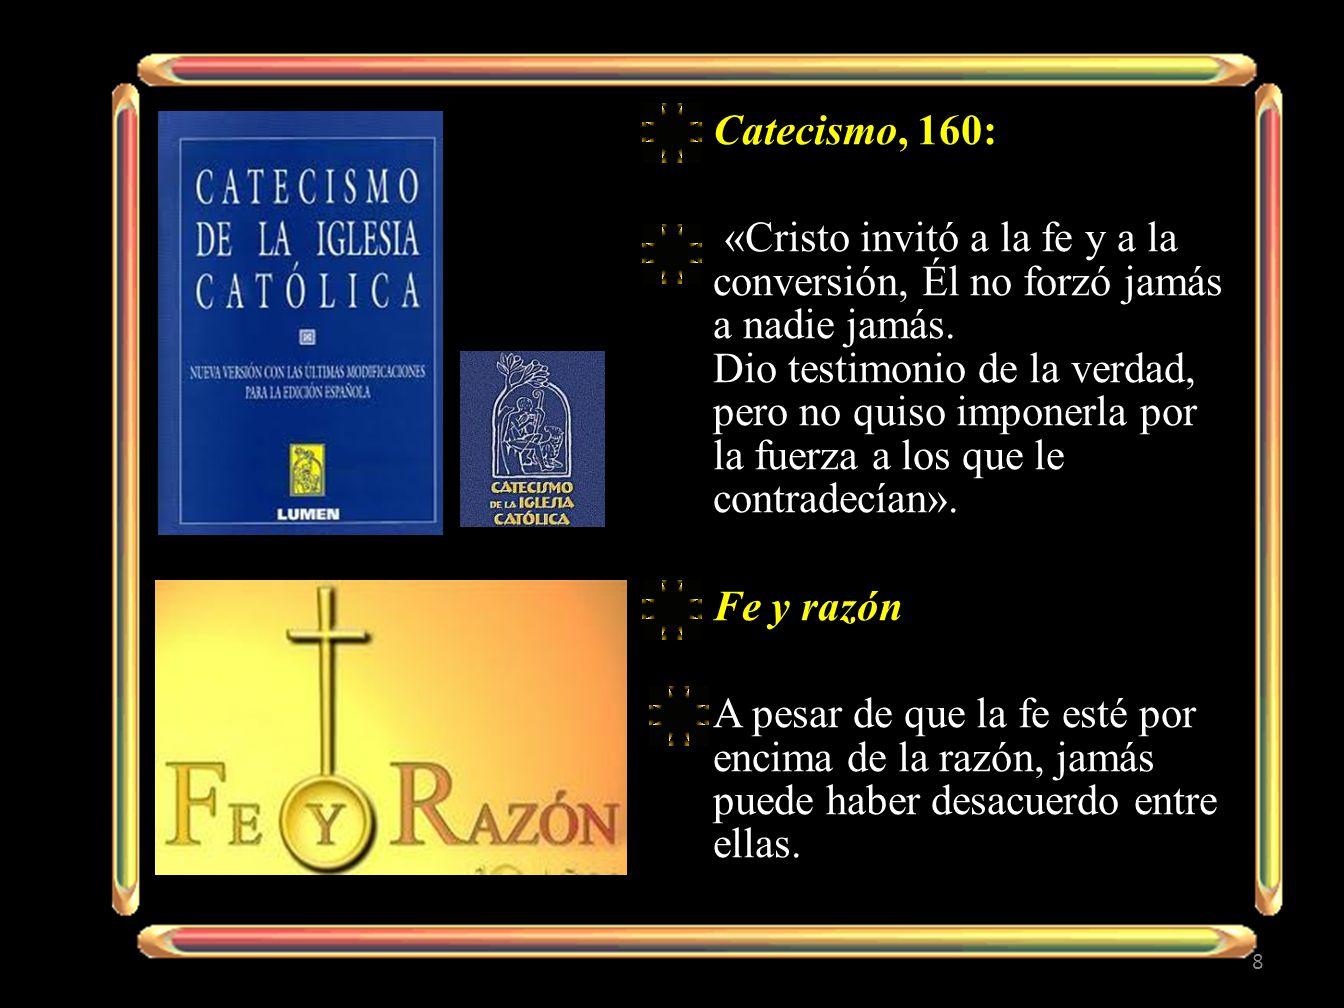 Catecismo, 160: